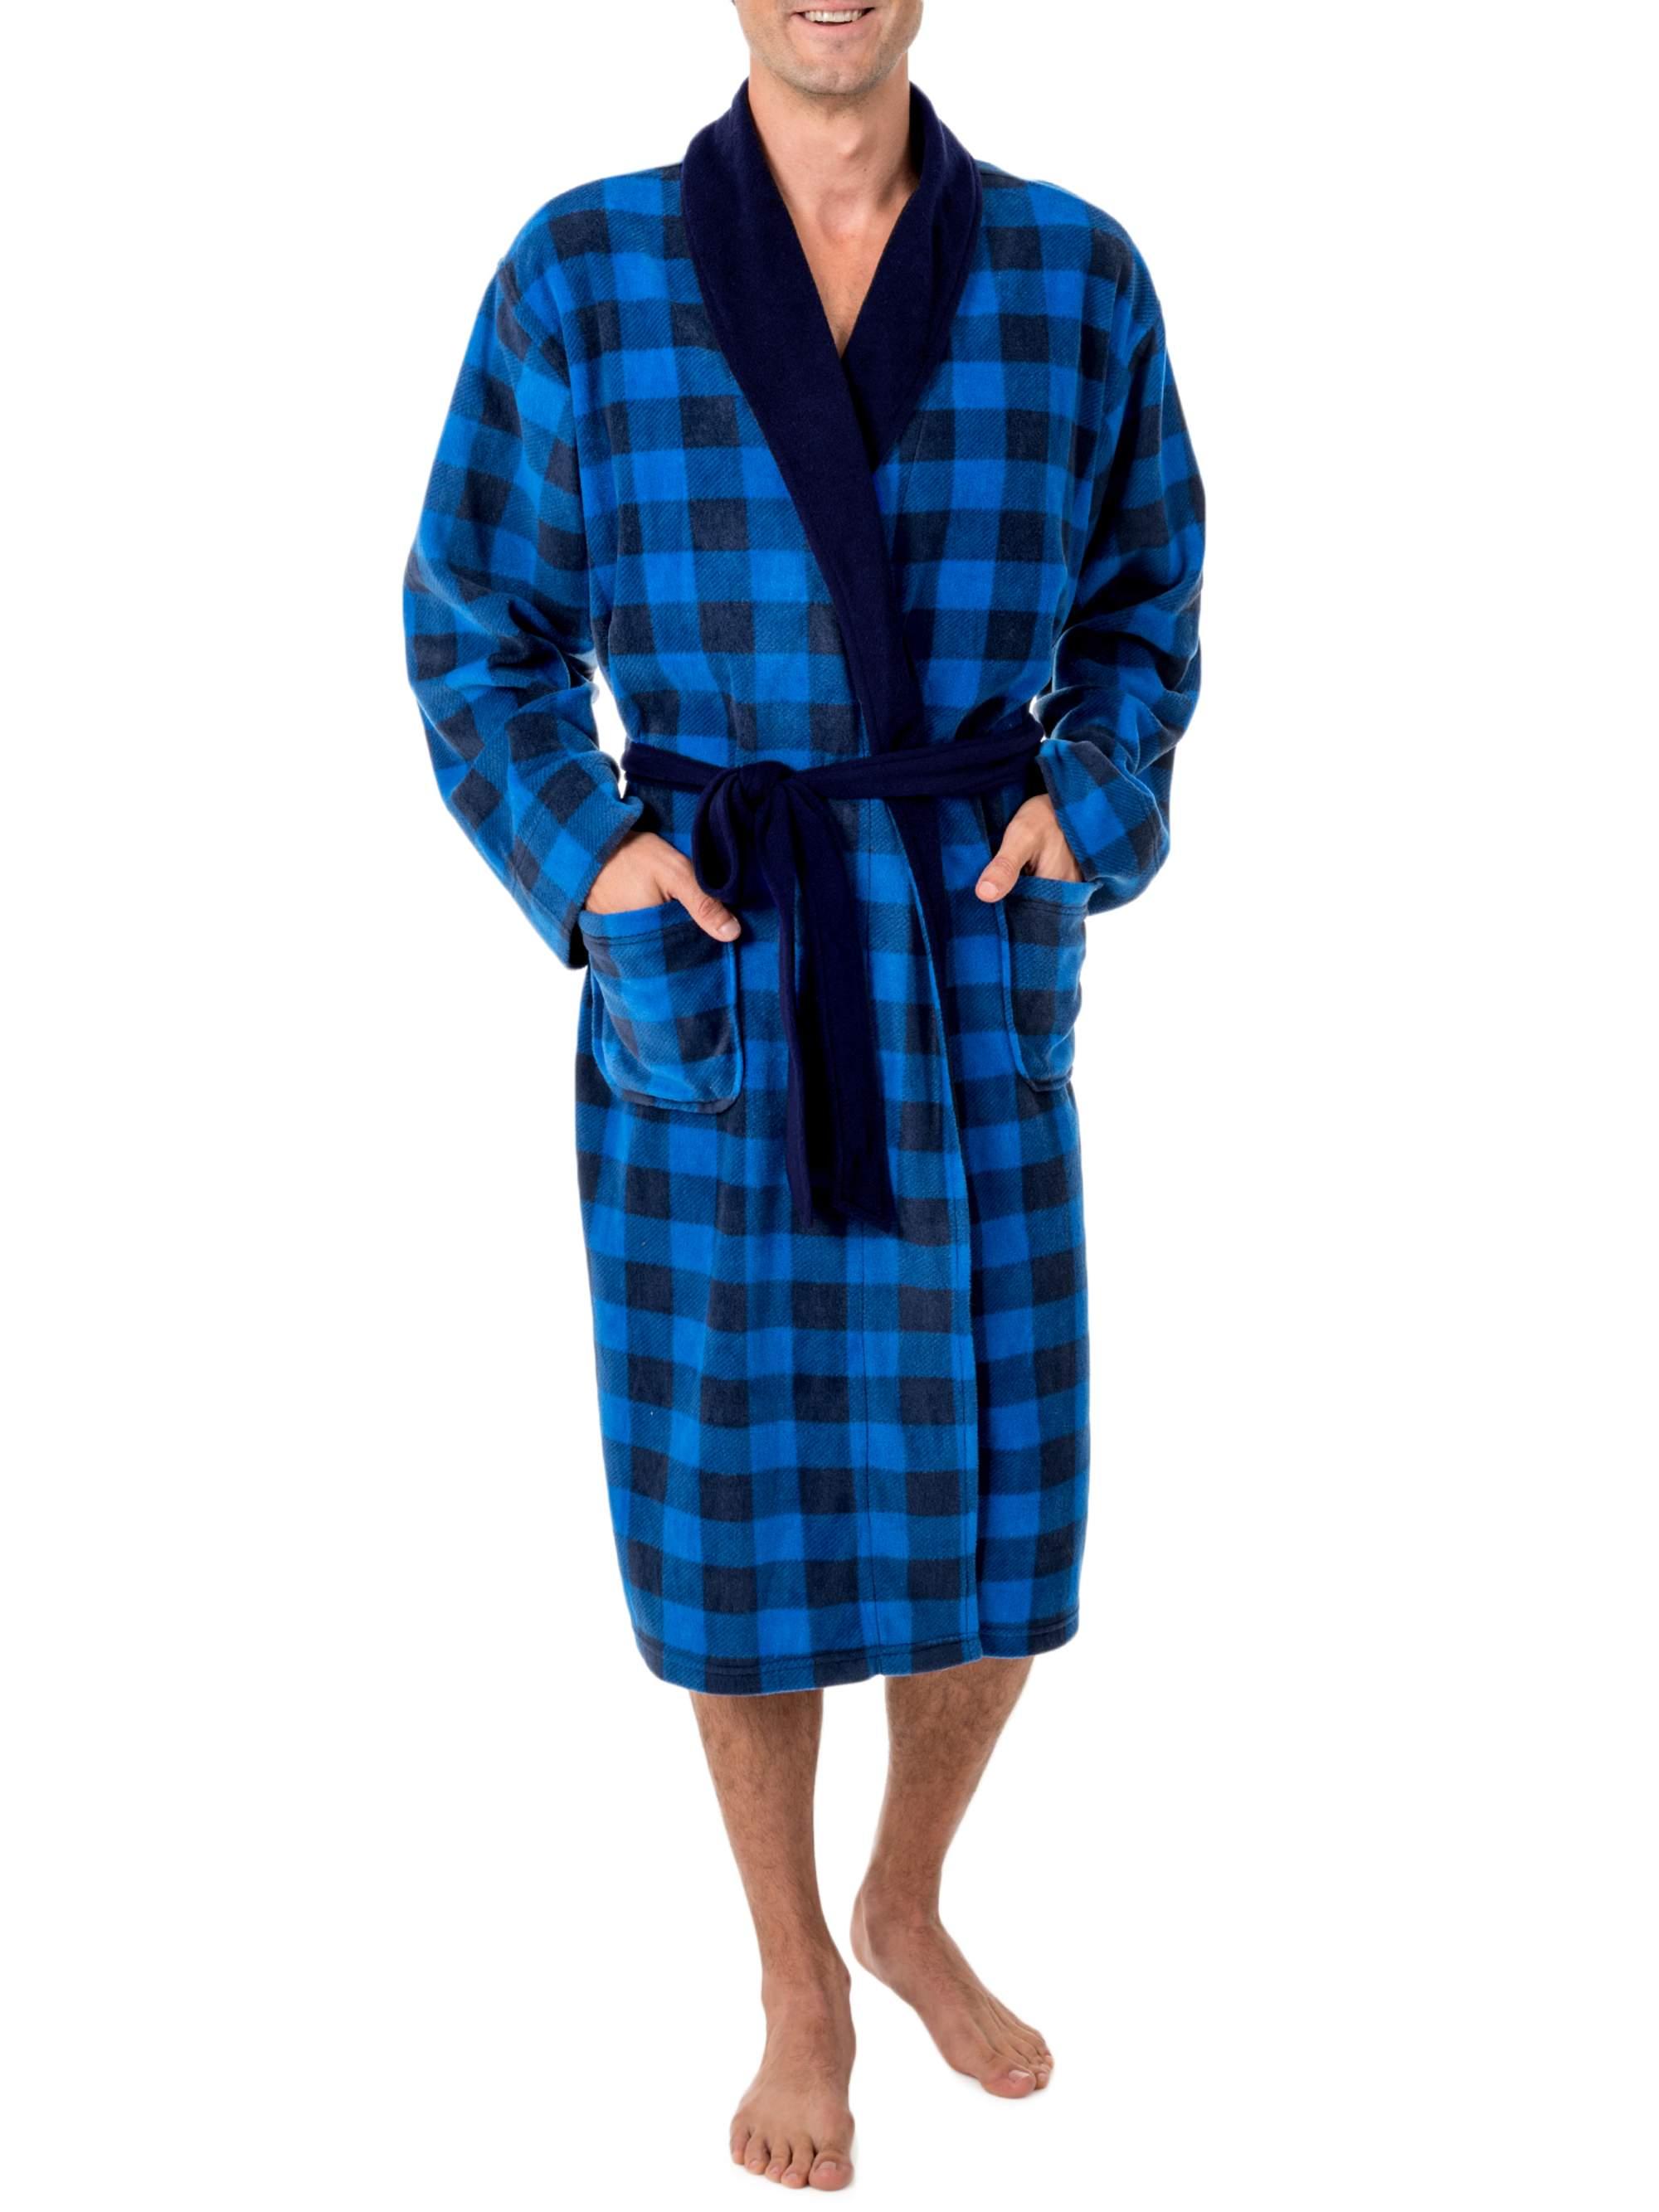 Big Size Men's Fleece Shawl Collar Robe